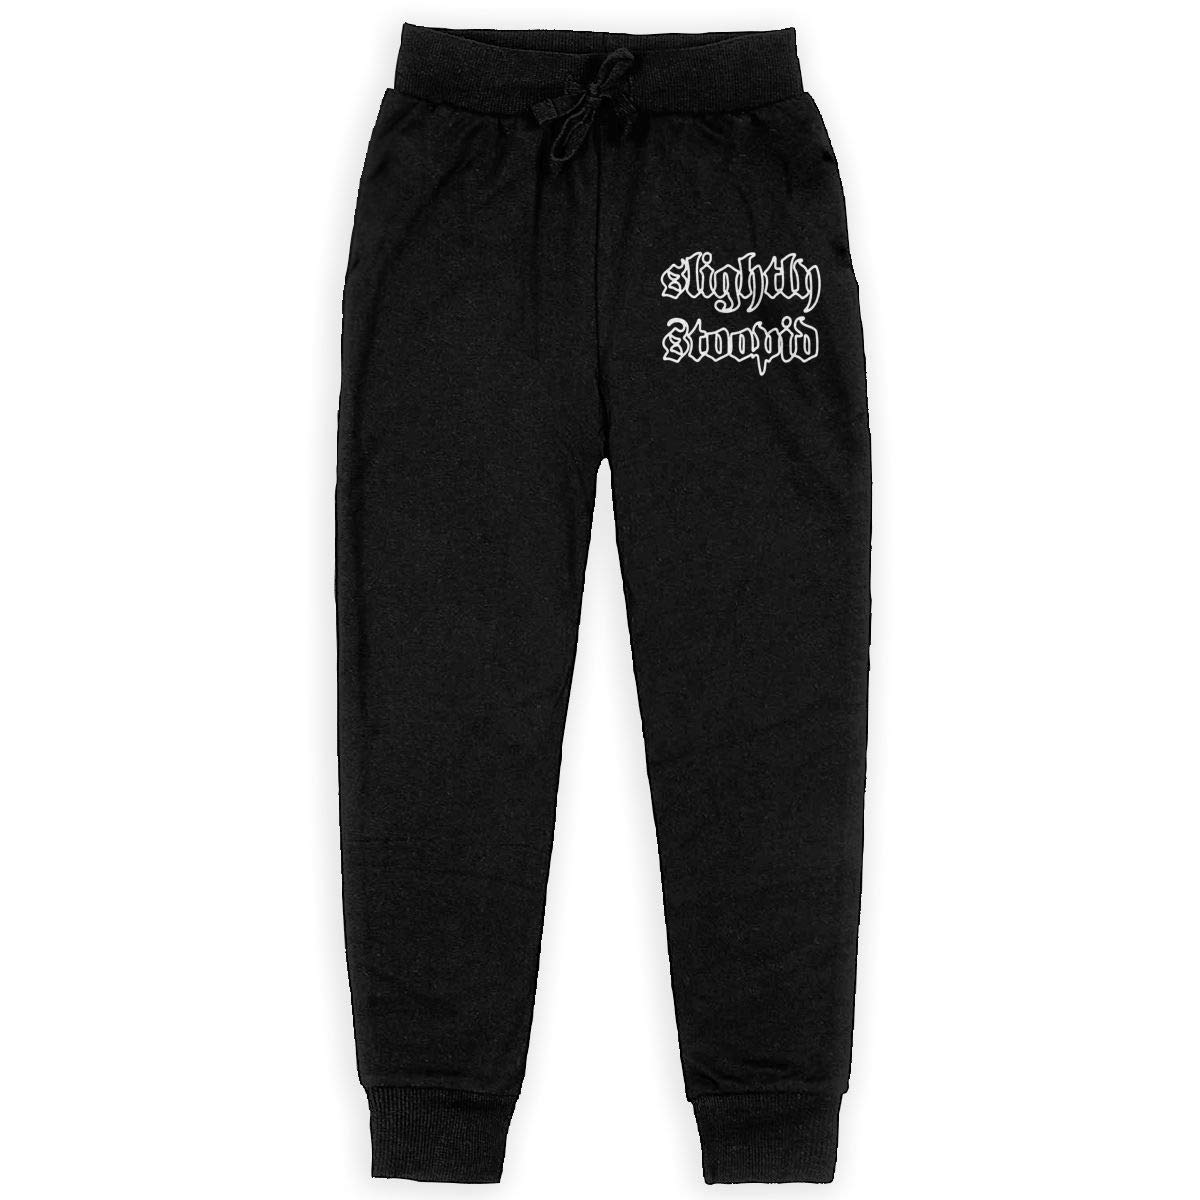 Kane Brown LETE Big Boys Girls Sport Jogger Pants Stretch Active Basic Sweatpants